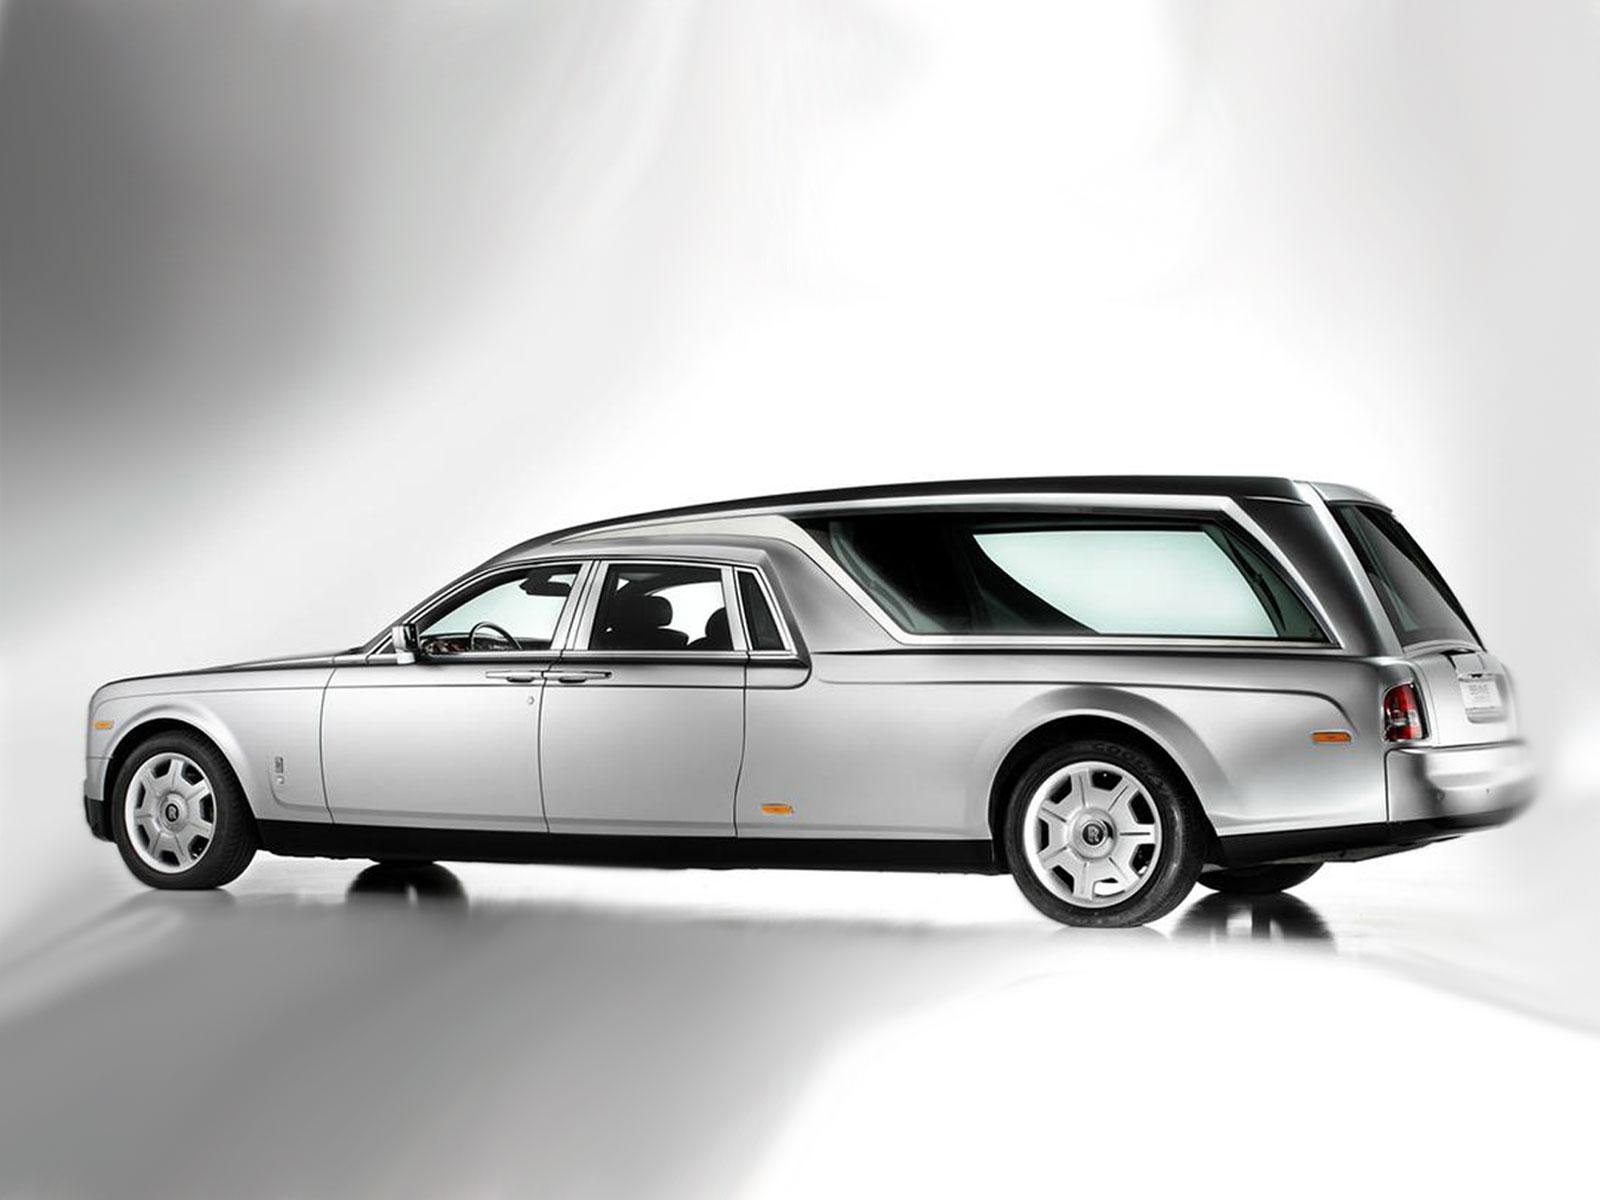 All-New-Rolls-Royce-Phantom-Hearse-picture.jpg